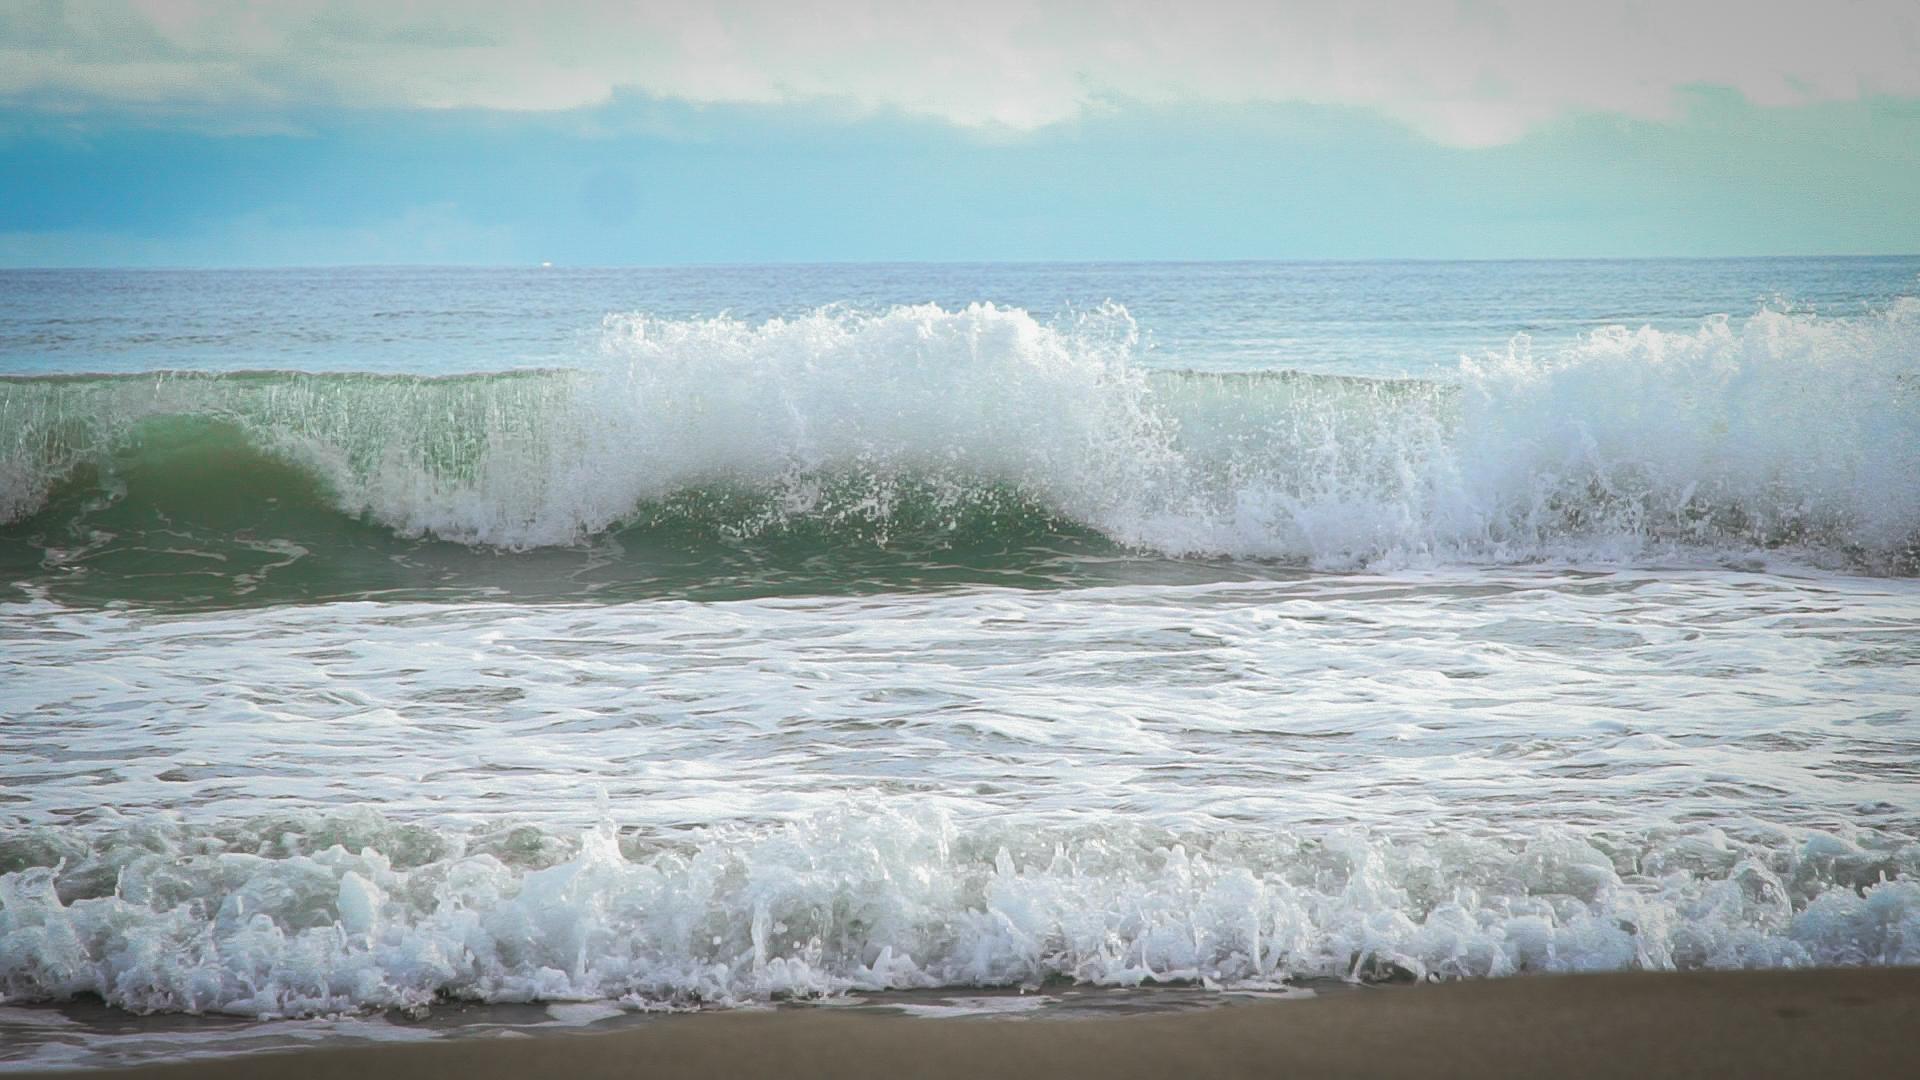 MAKING WAVES. Gubat, Sorsogon is an emerging surfing spot in Luzon. Photo by Vee Salazar/Rappler